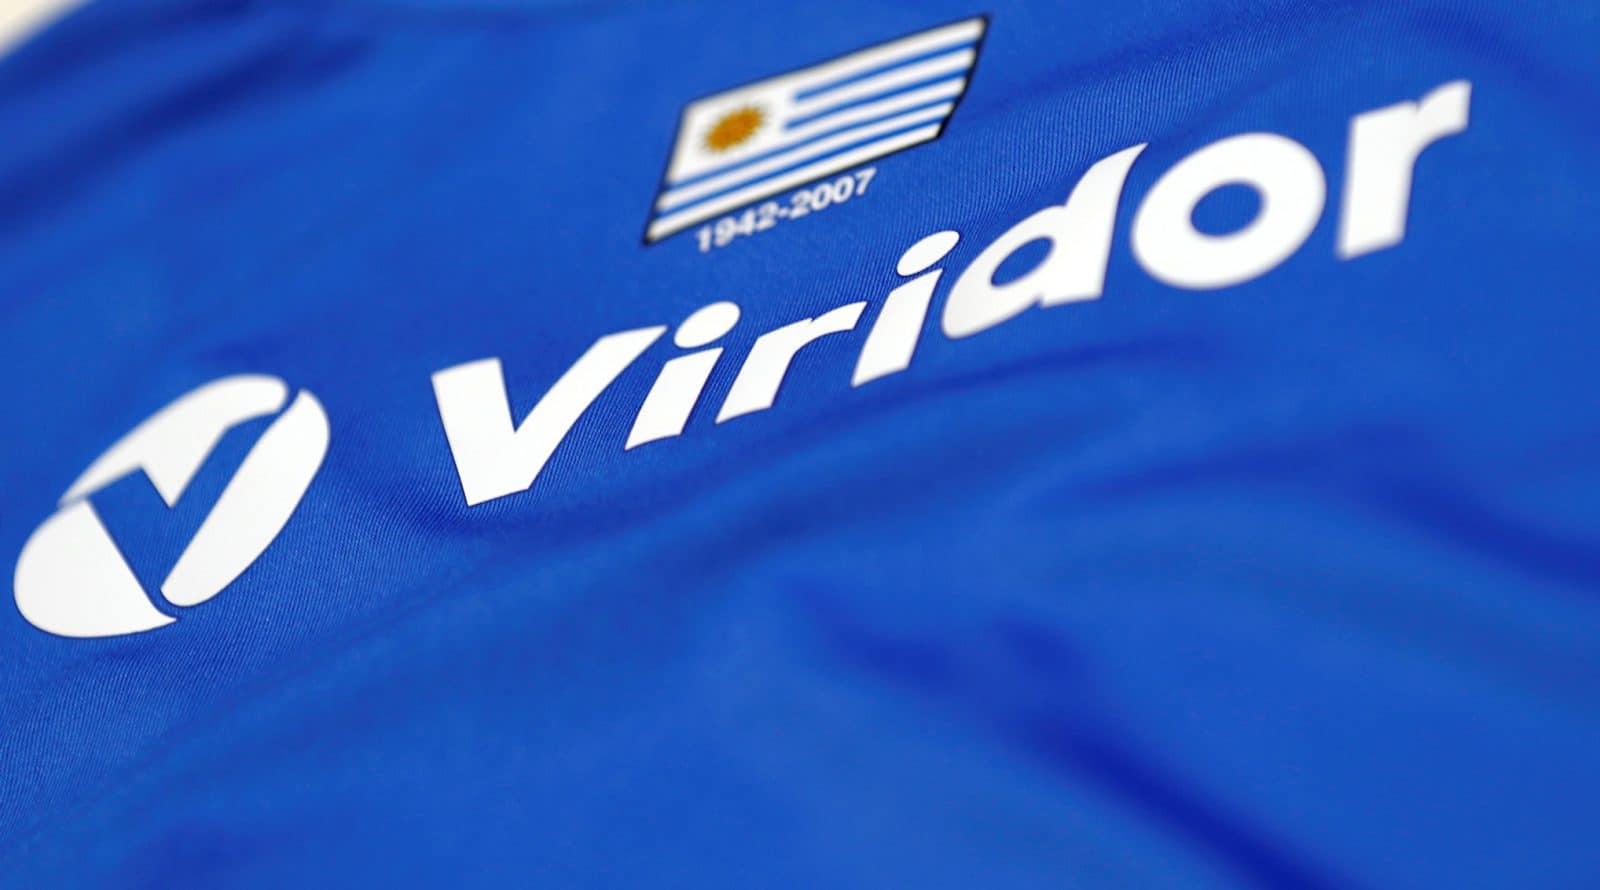 Viridor Get Behind County For The 2017 18 Season